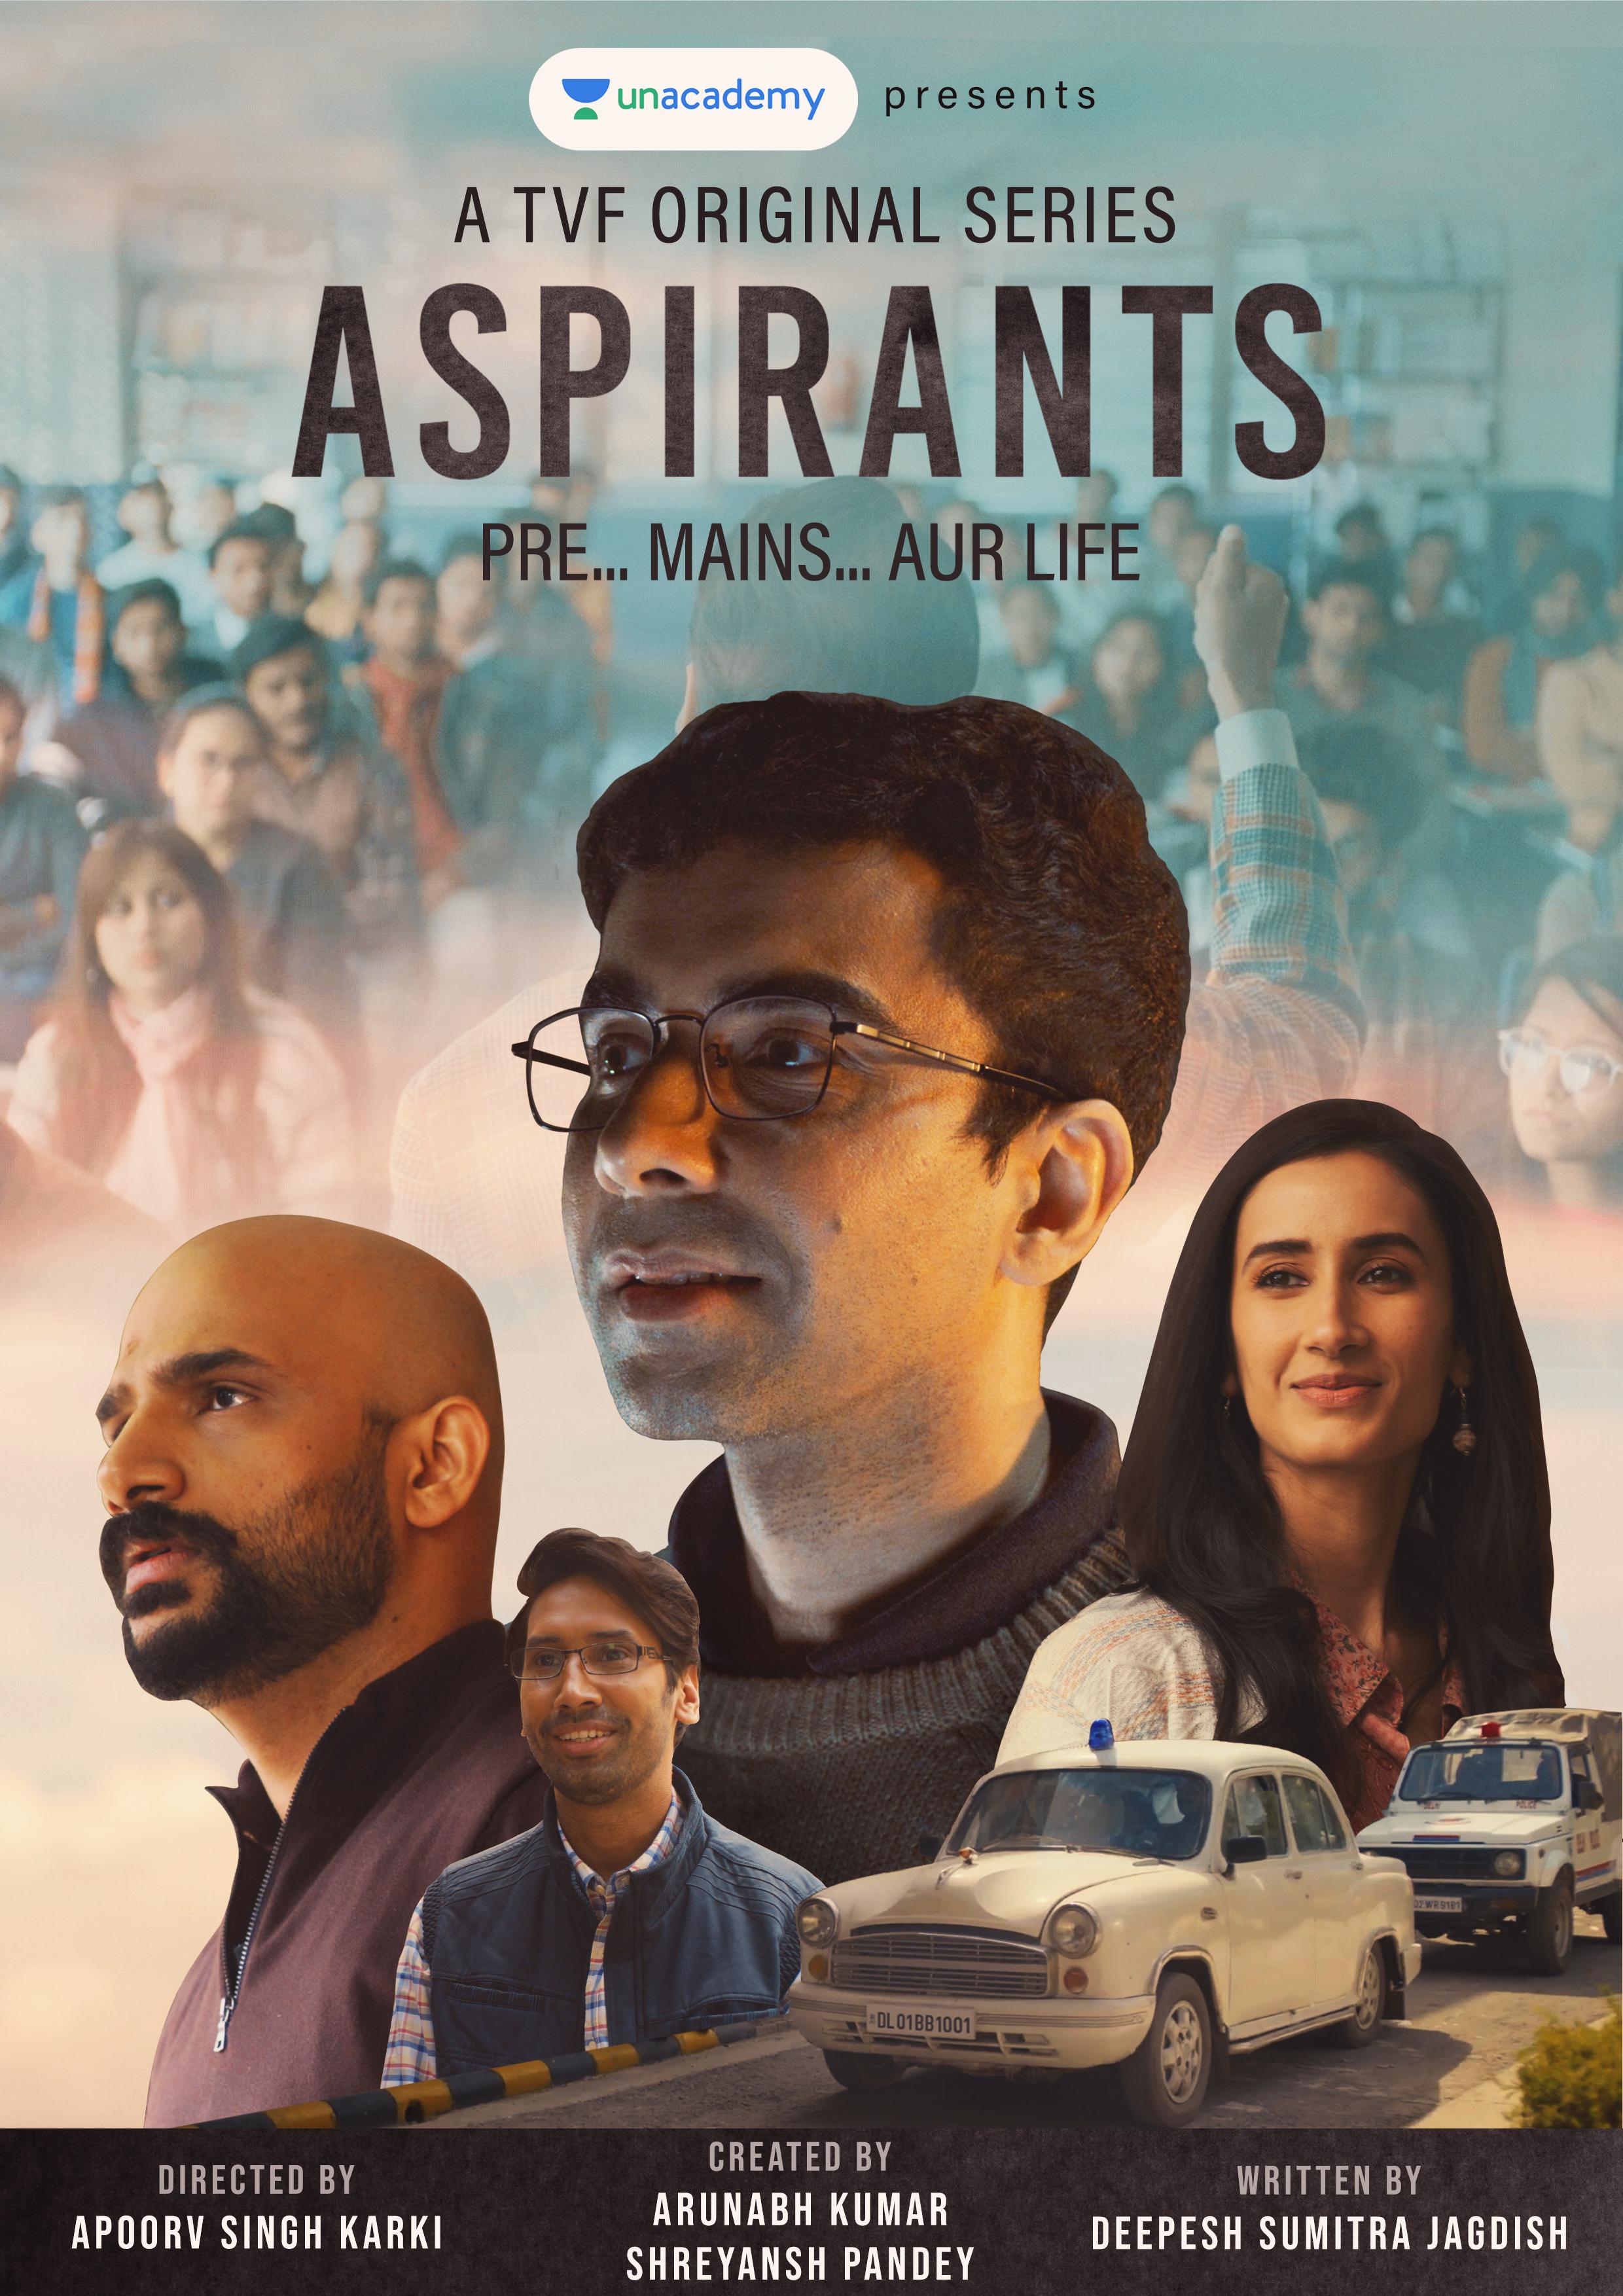 Download Aspirants (2021) Season 1 Hindi Complete TVF Original WEB Series 480p | 720p HDRip